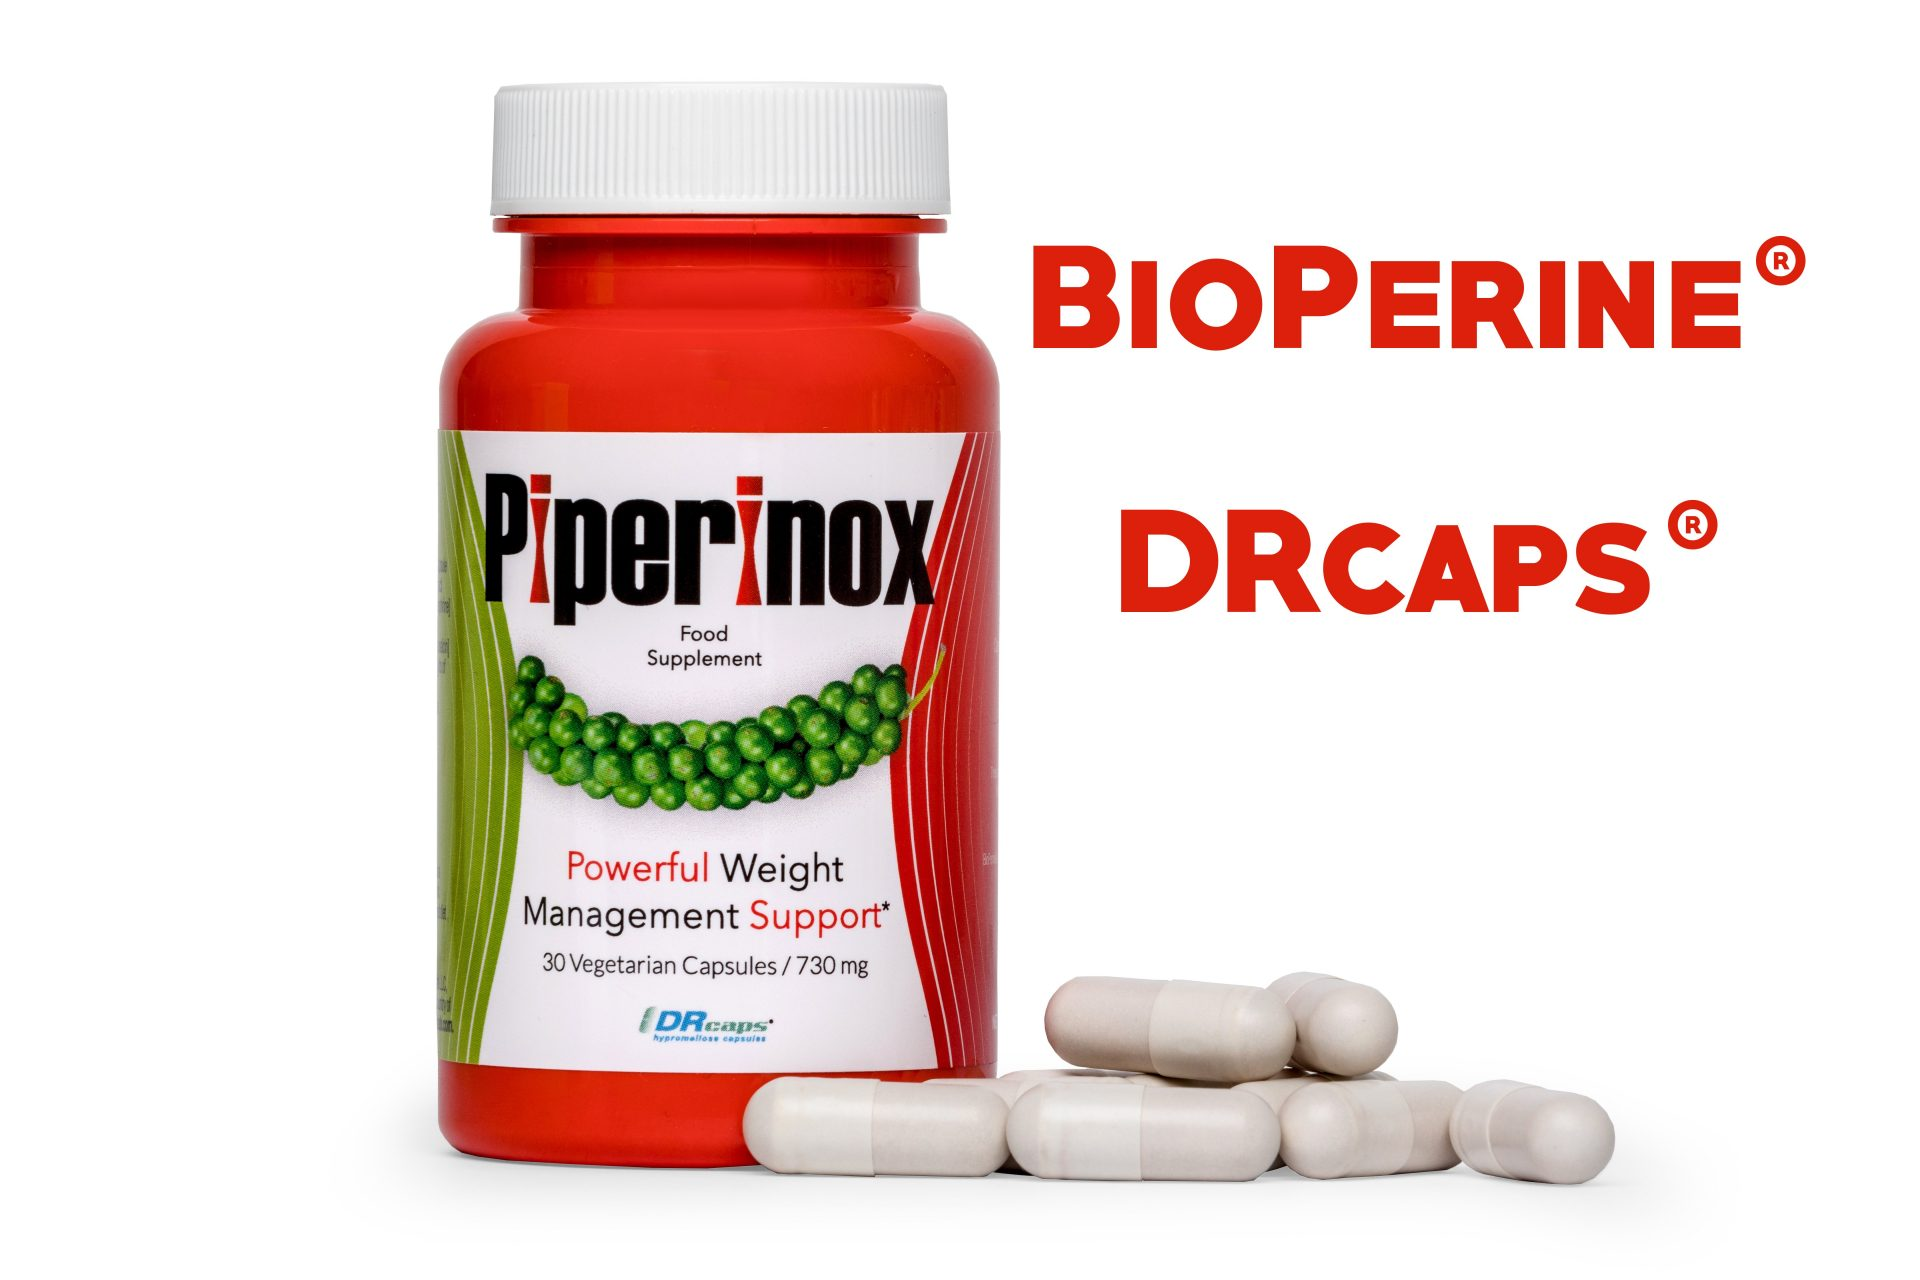 Piperinox w kapsułce DRcaps®